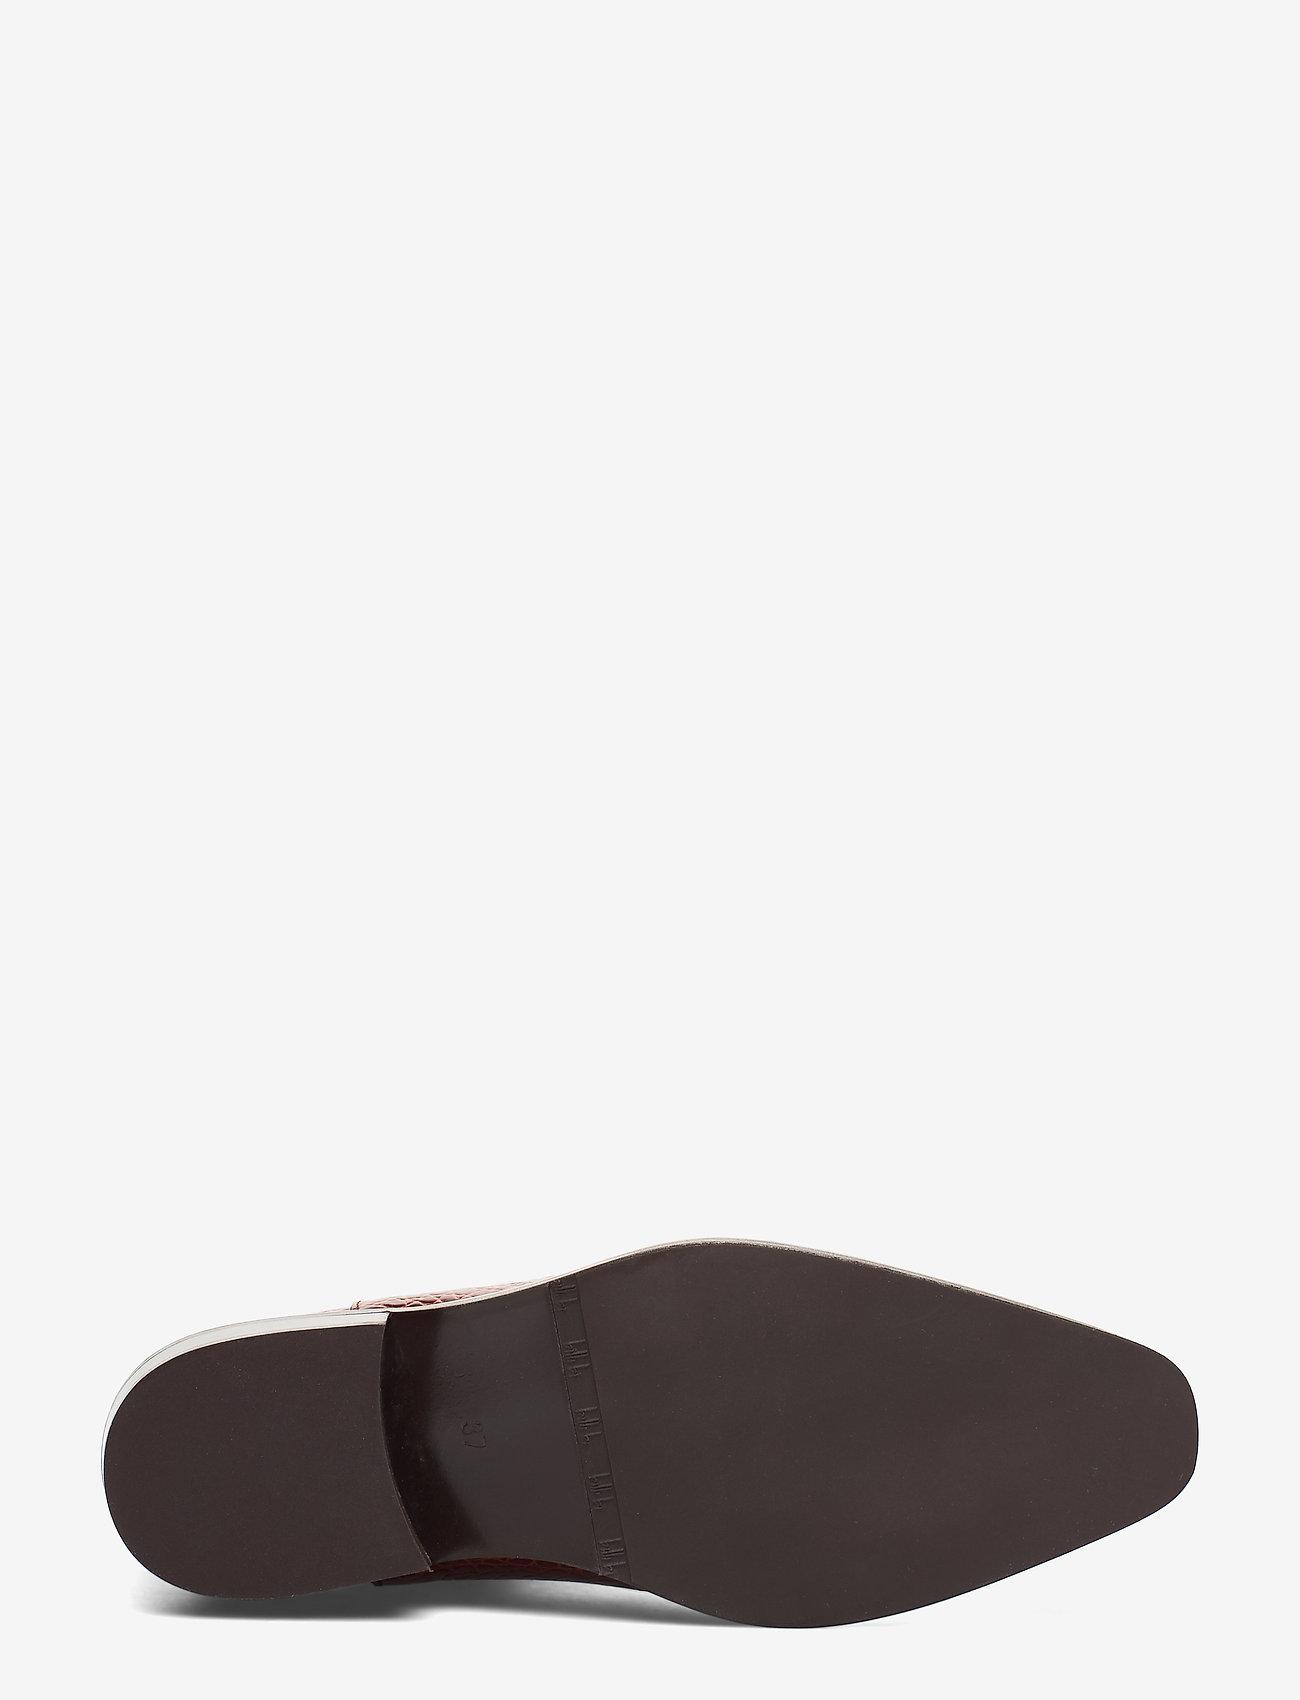 Boots (Cognac Yango 15) - Billi Bi